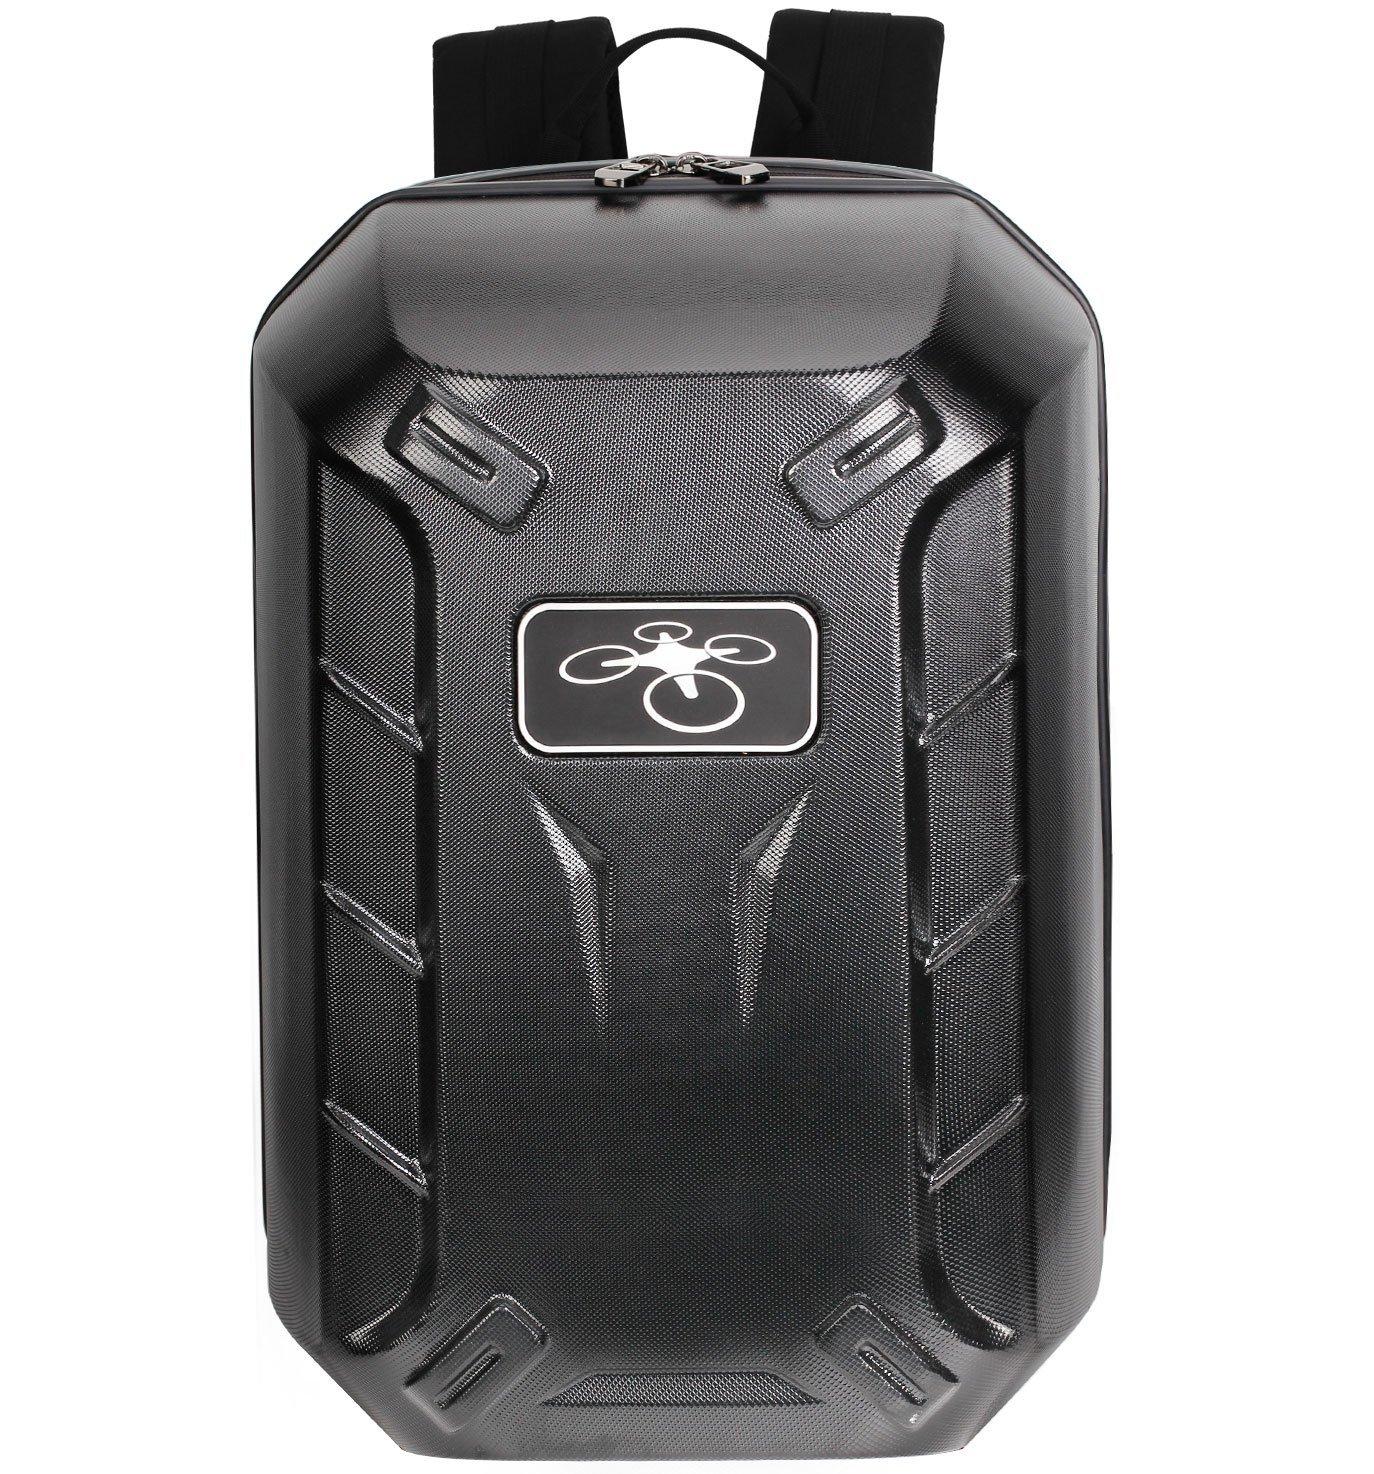 DJI Phantom 3 Backpack Carry Case Hardshell Phantom 3 Standard Professional Advanced Drone Bag Box Backpack